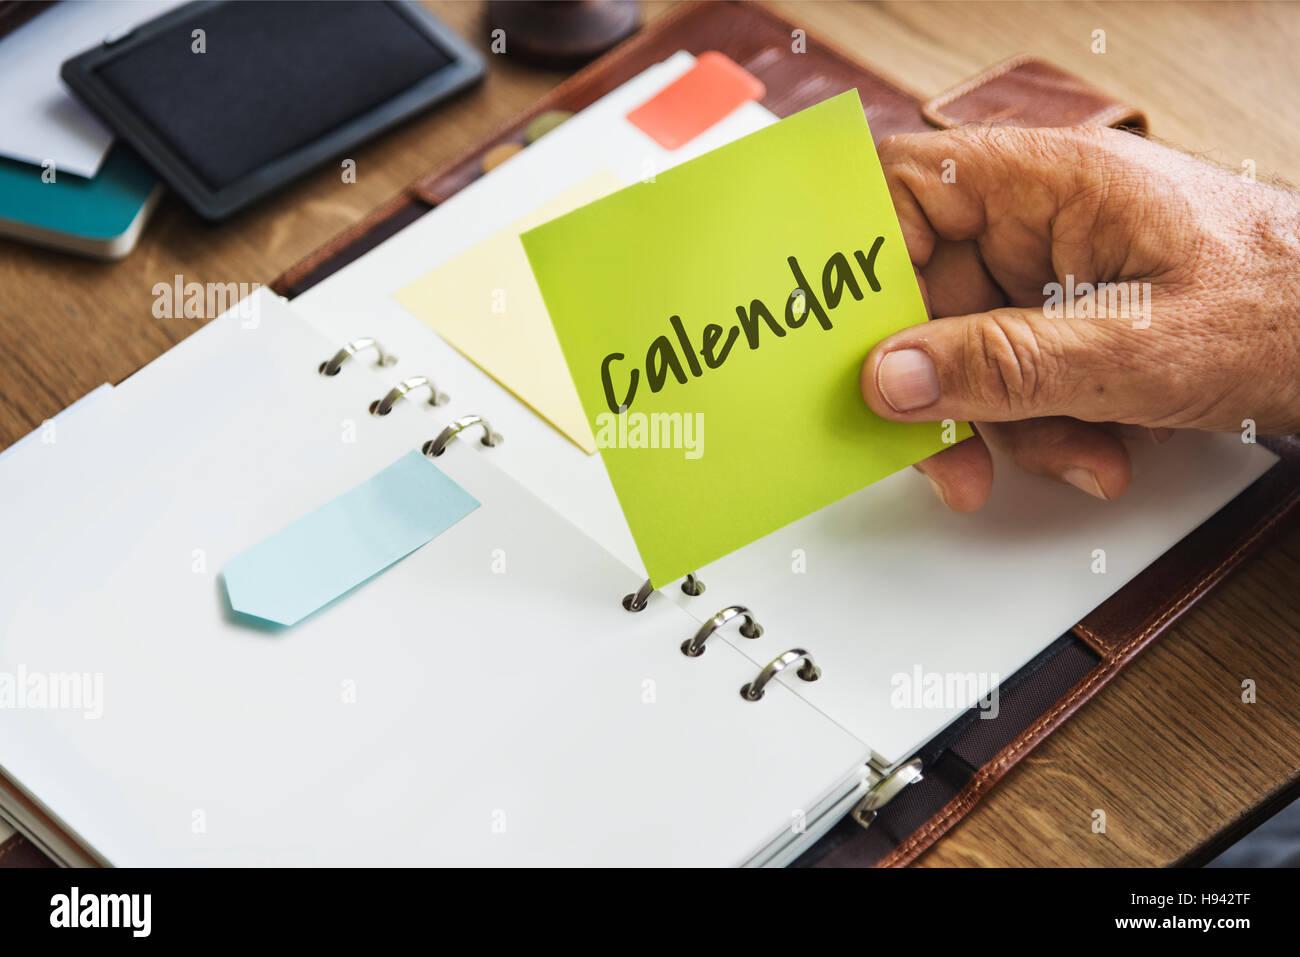 Calendar Urgent Attention Agenda Concept - Stock Image